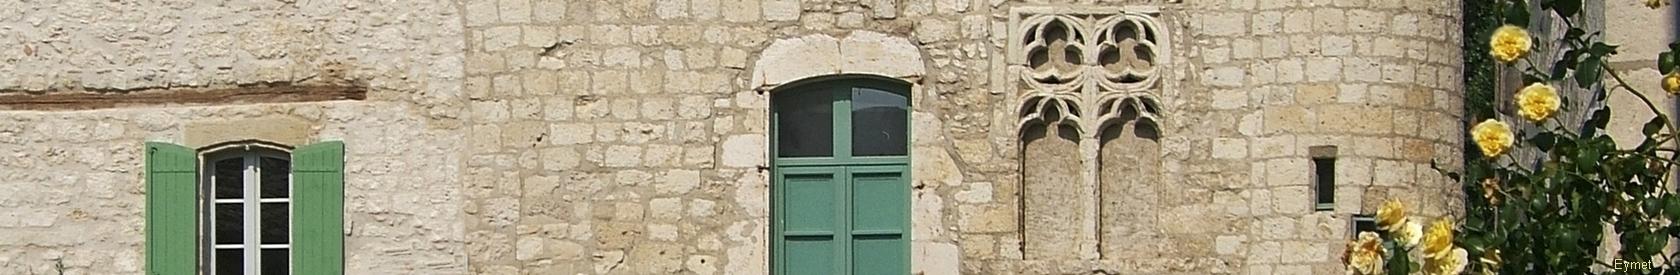 47 Lot-et-Garonne